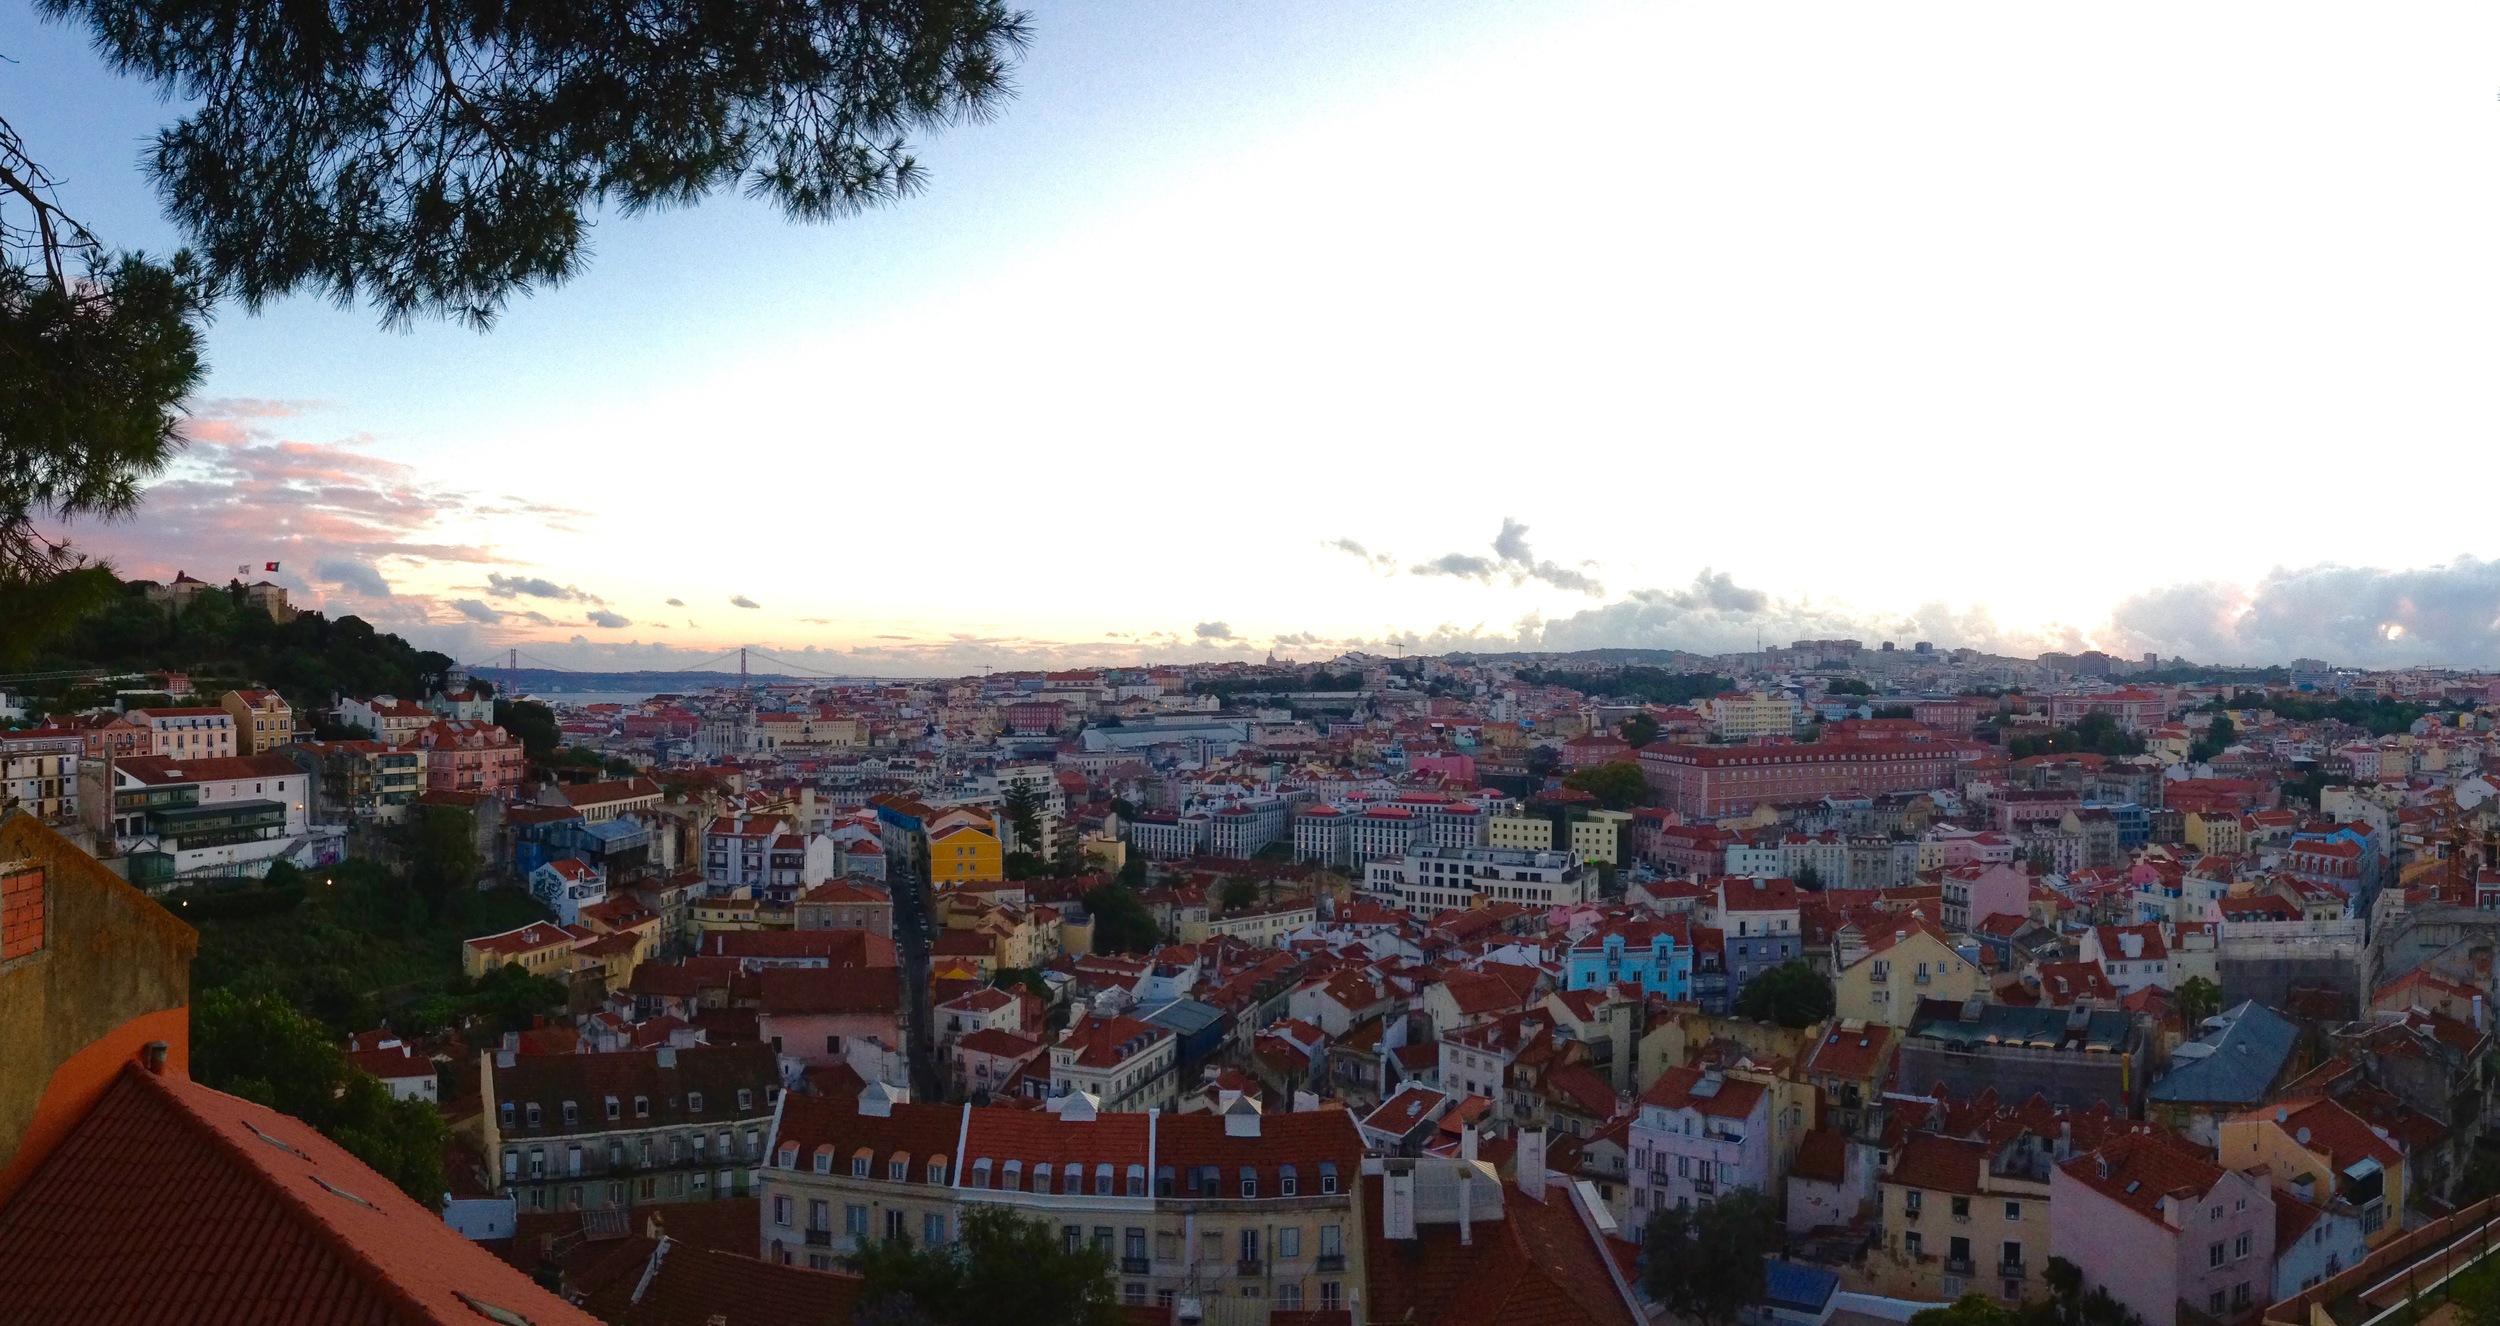 Lisbon, from the Miradouro da Graça, Portugal